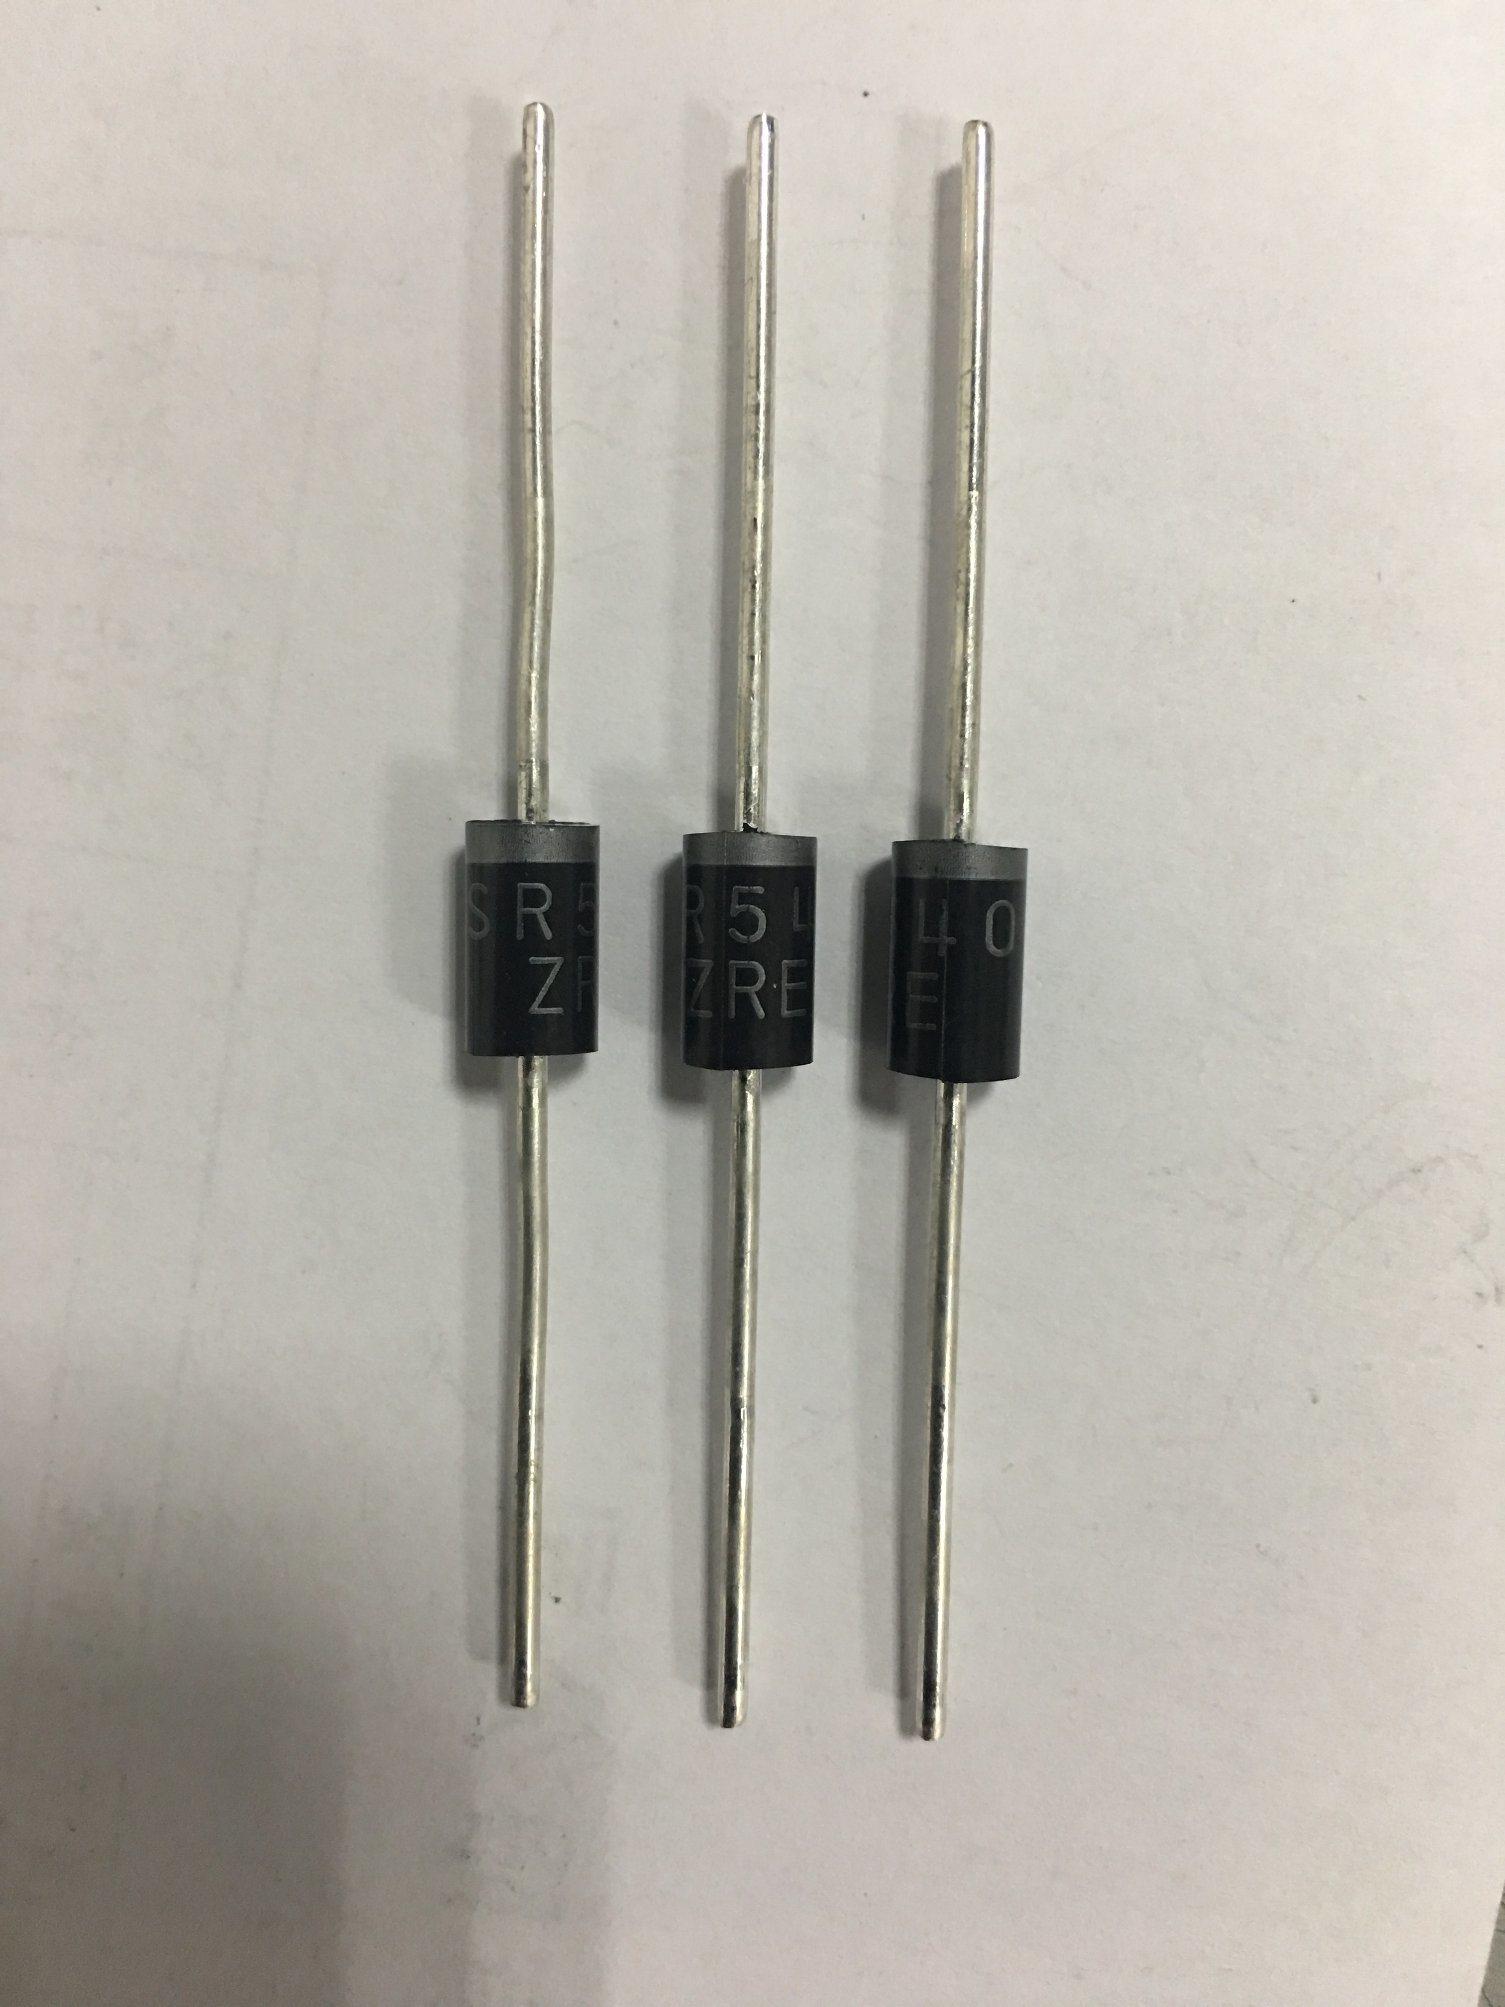 5A Schottky Rectifier Bridge Sb (R) 520 Thru Sb (R) 5200 Do-27 Package